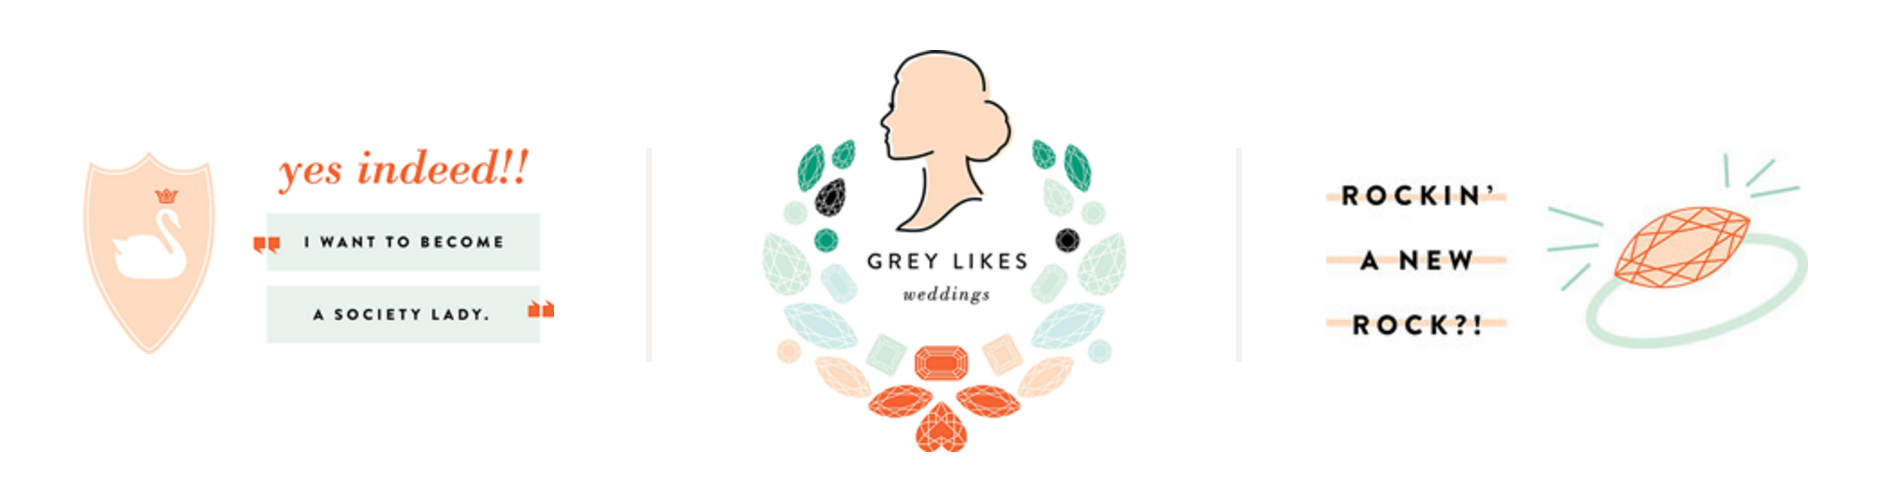 blueberryphotography.com | http://www.greylikesweddings.com/real-weddings/chelsea-lances-wedding-nestldown/